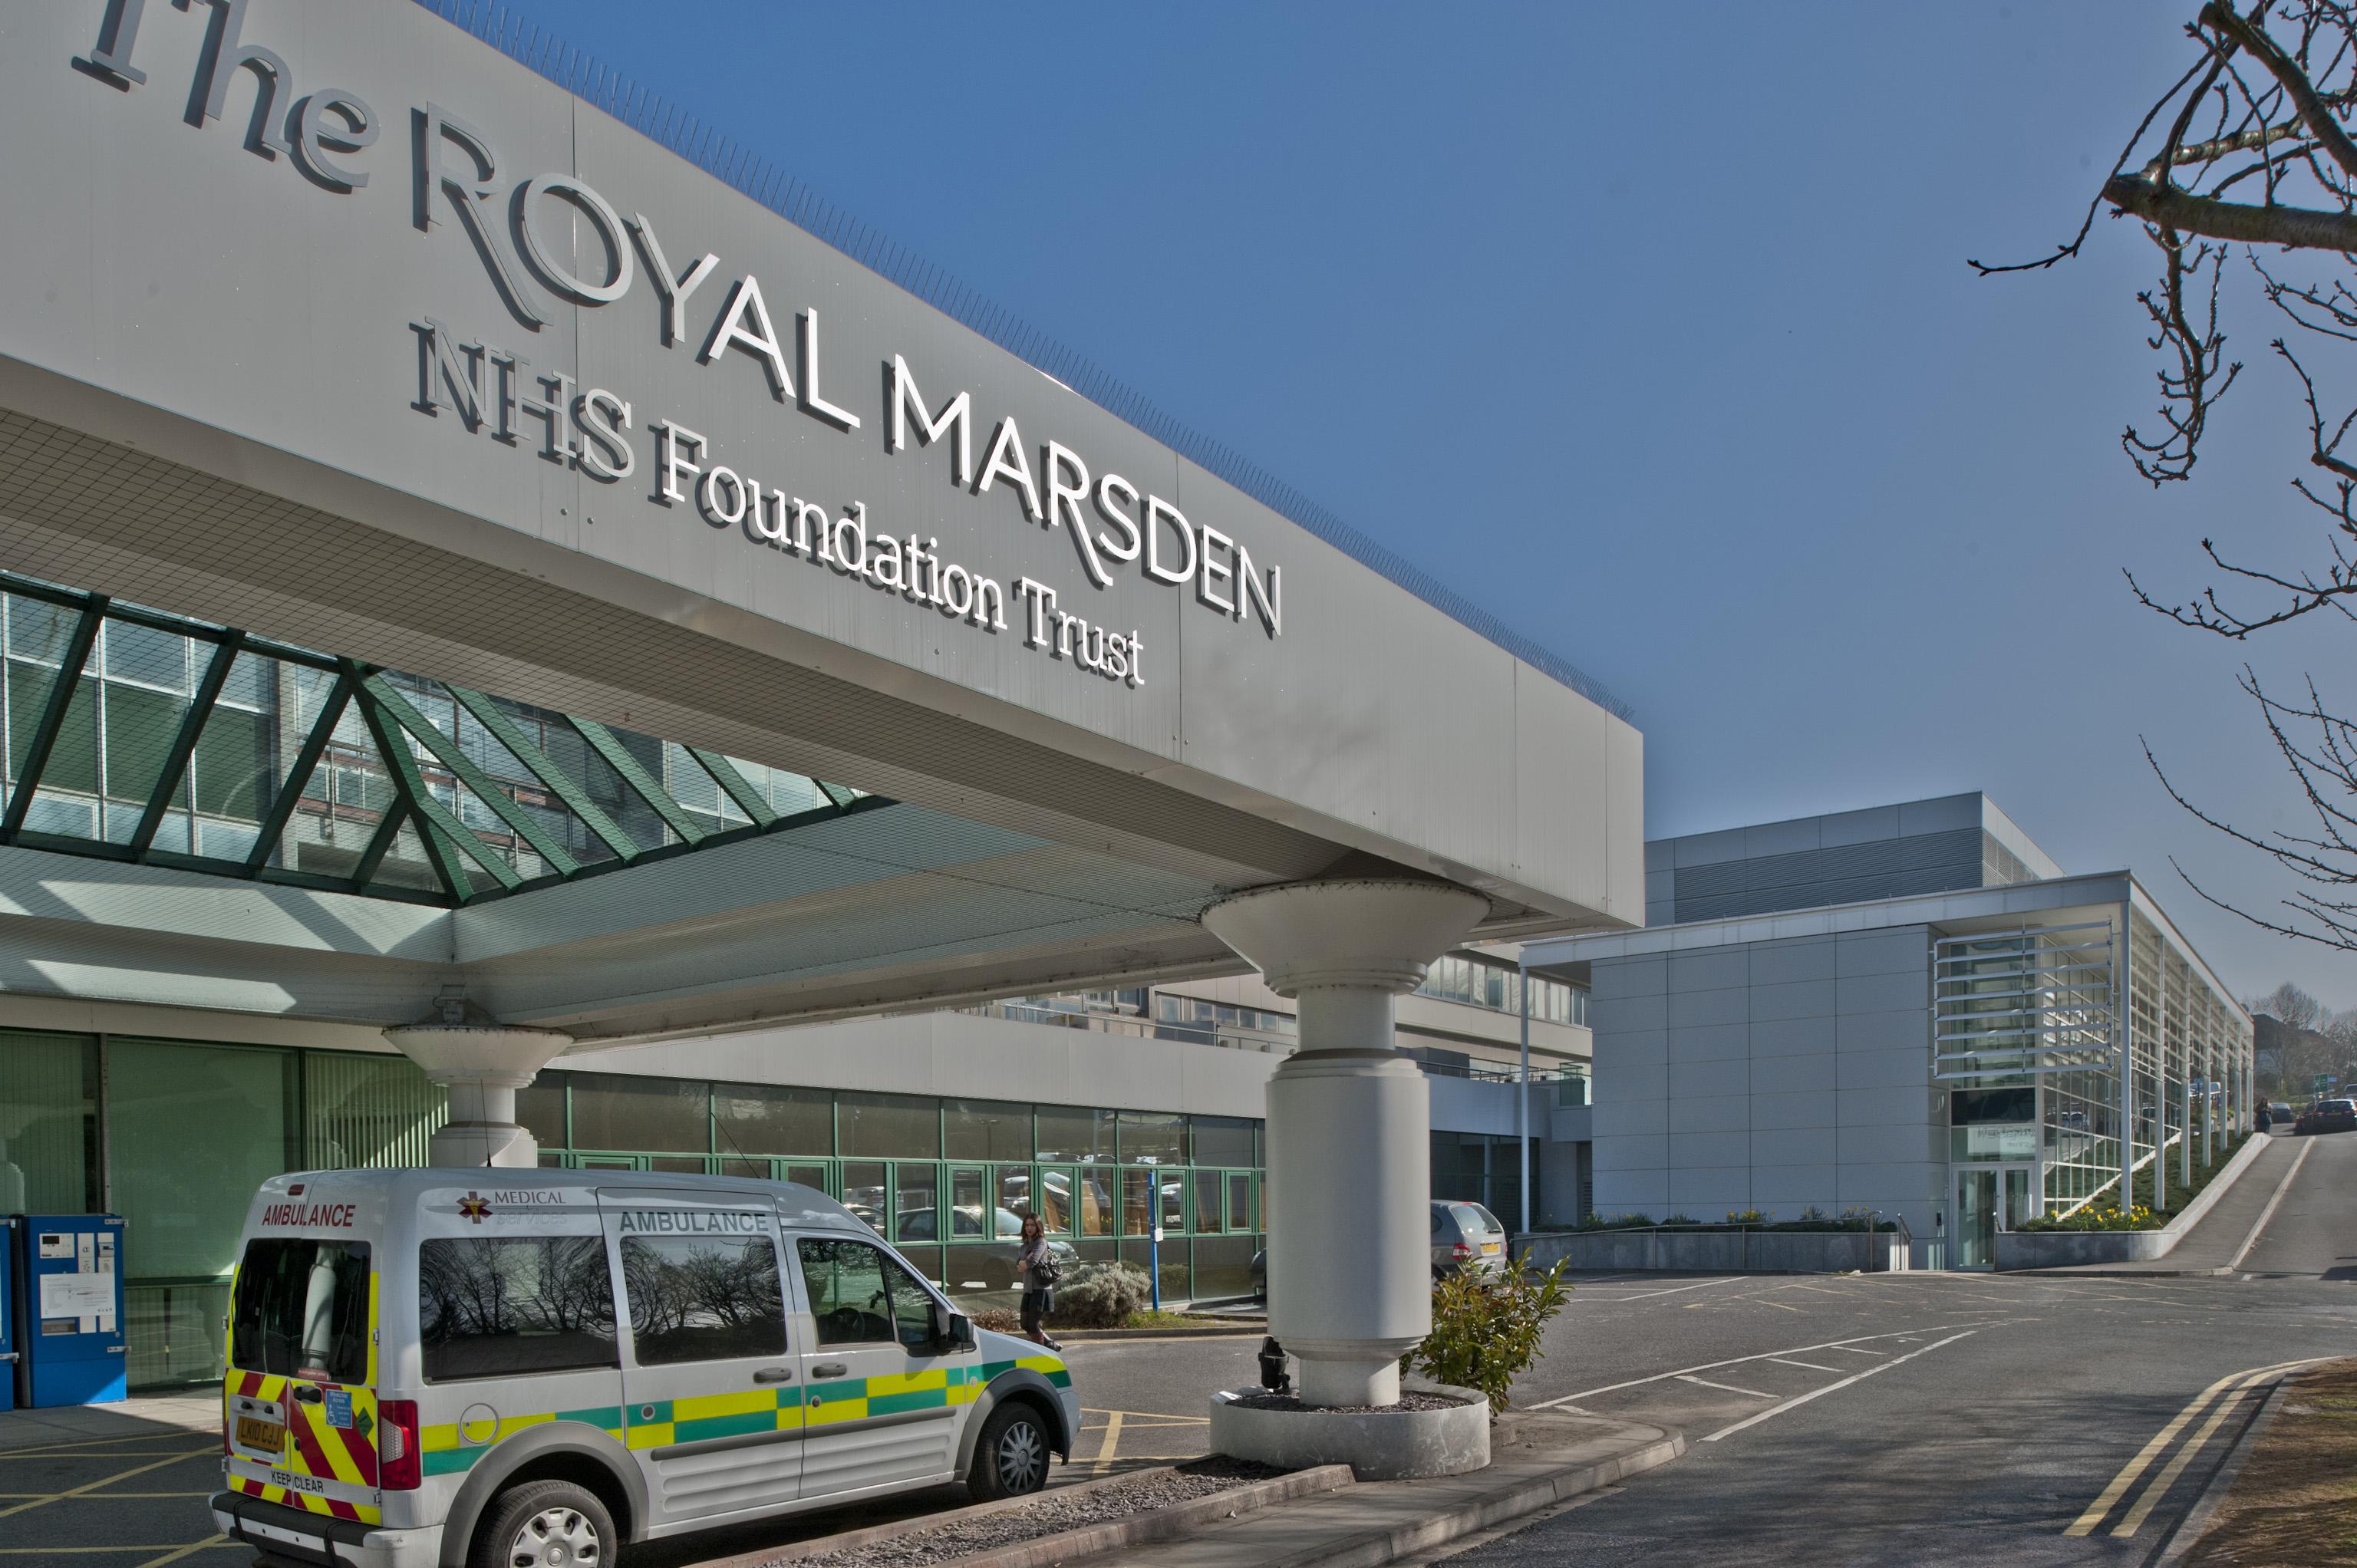 RoyalMarsden_TBM0328.JPG